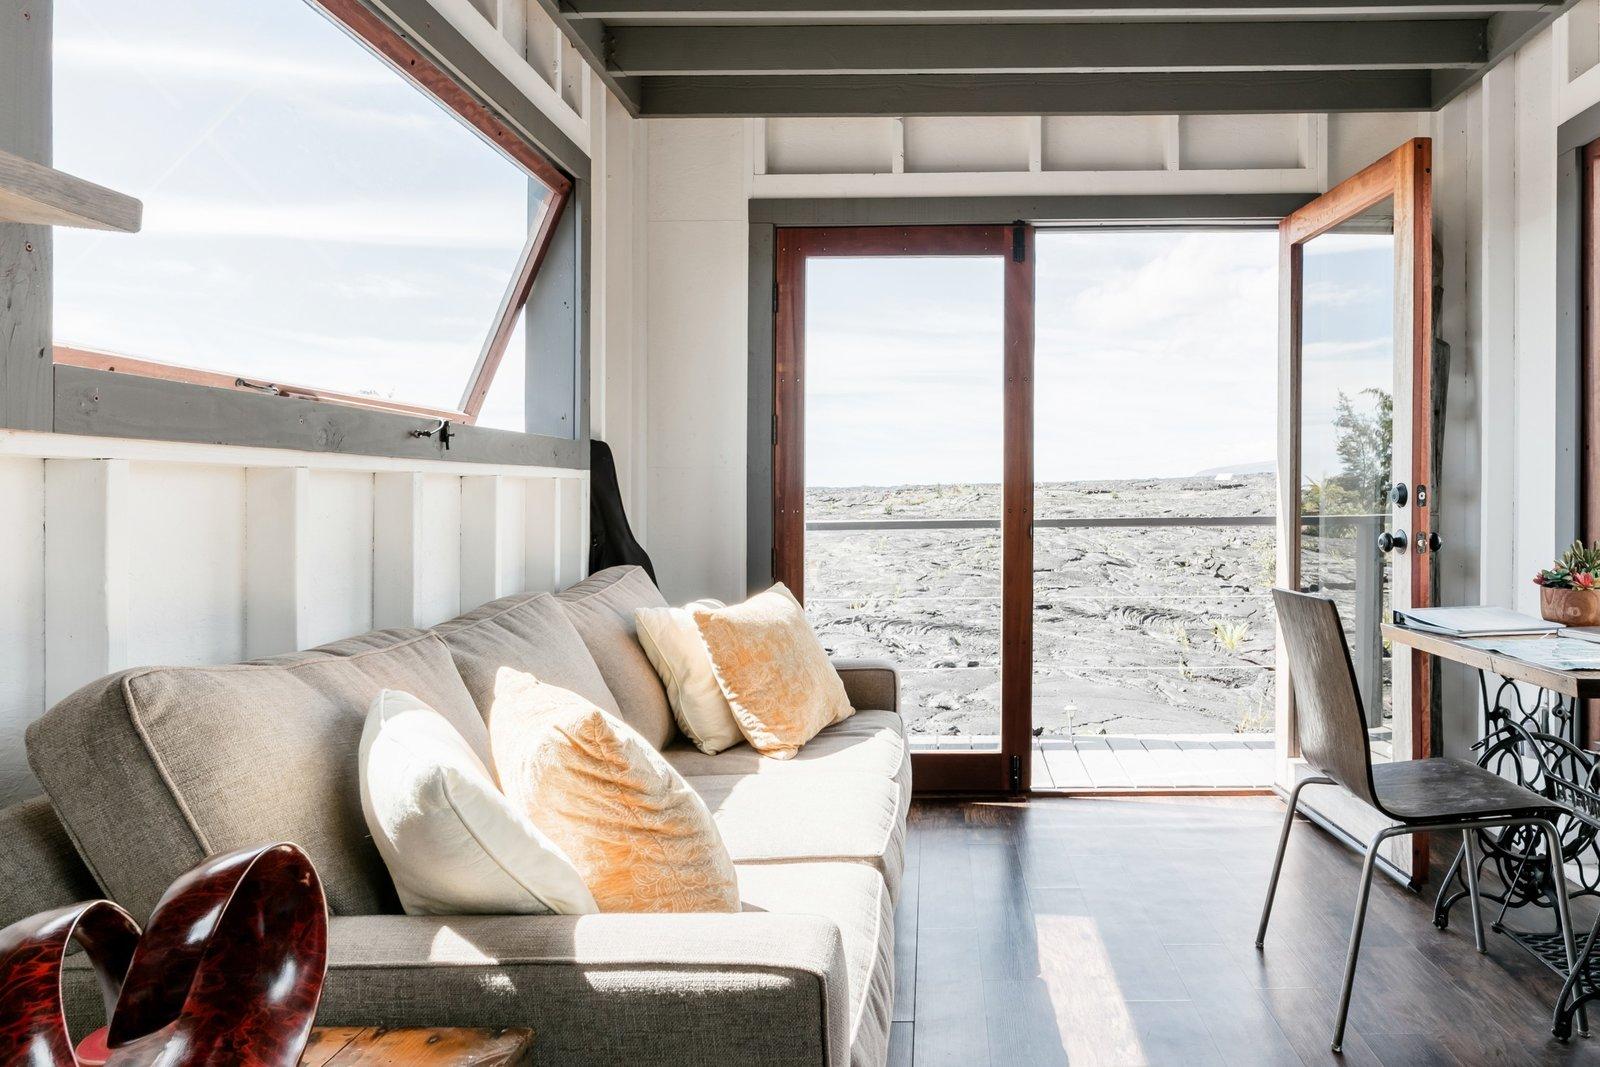 tiny homes interior walls